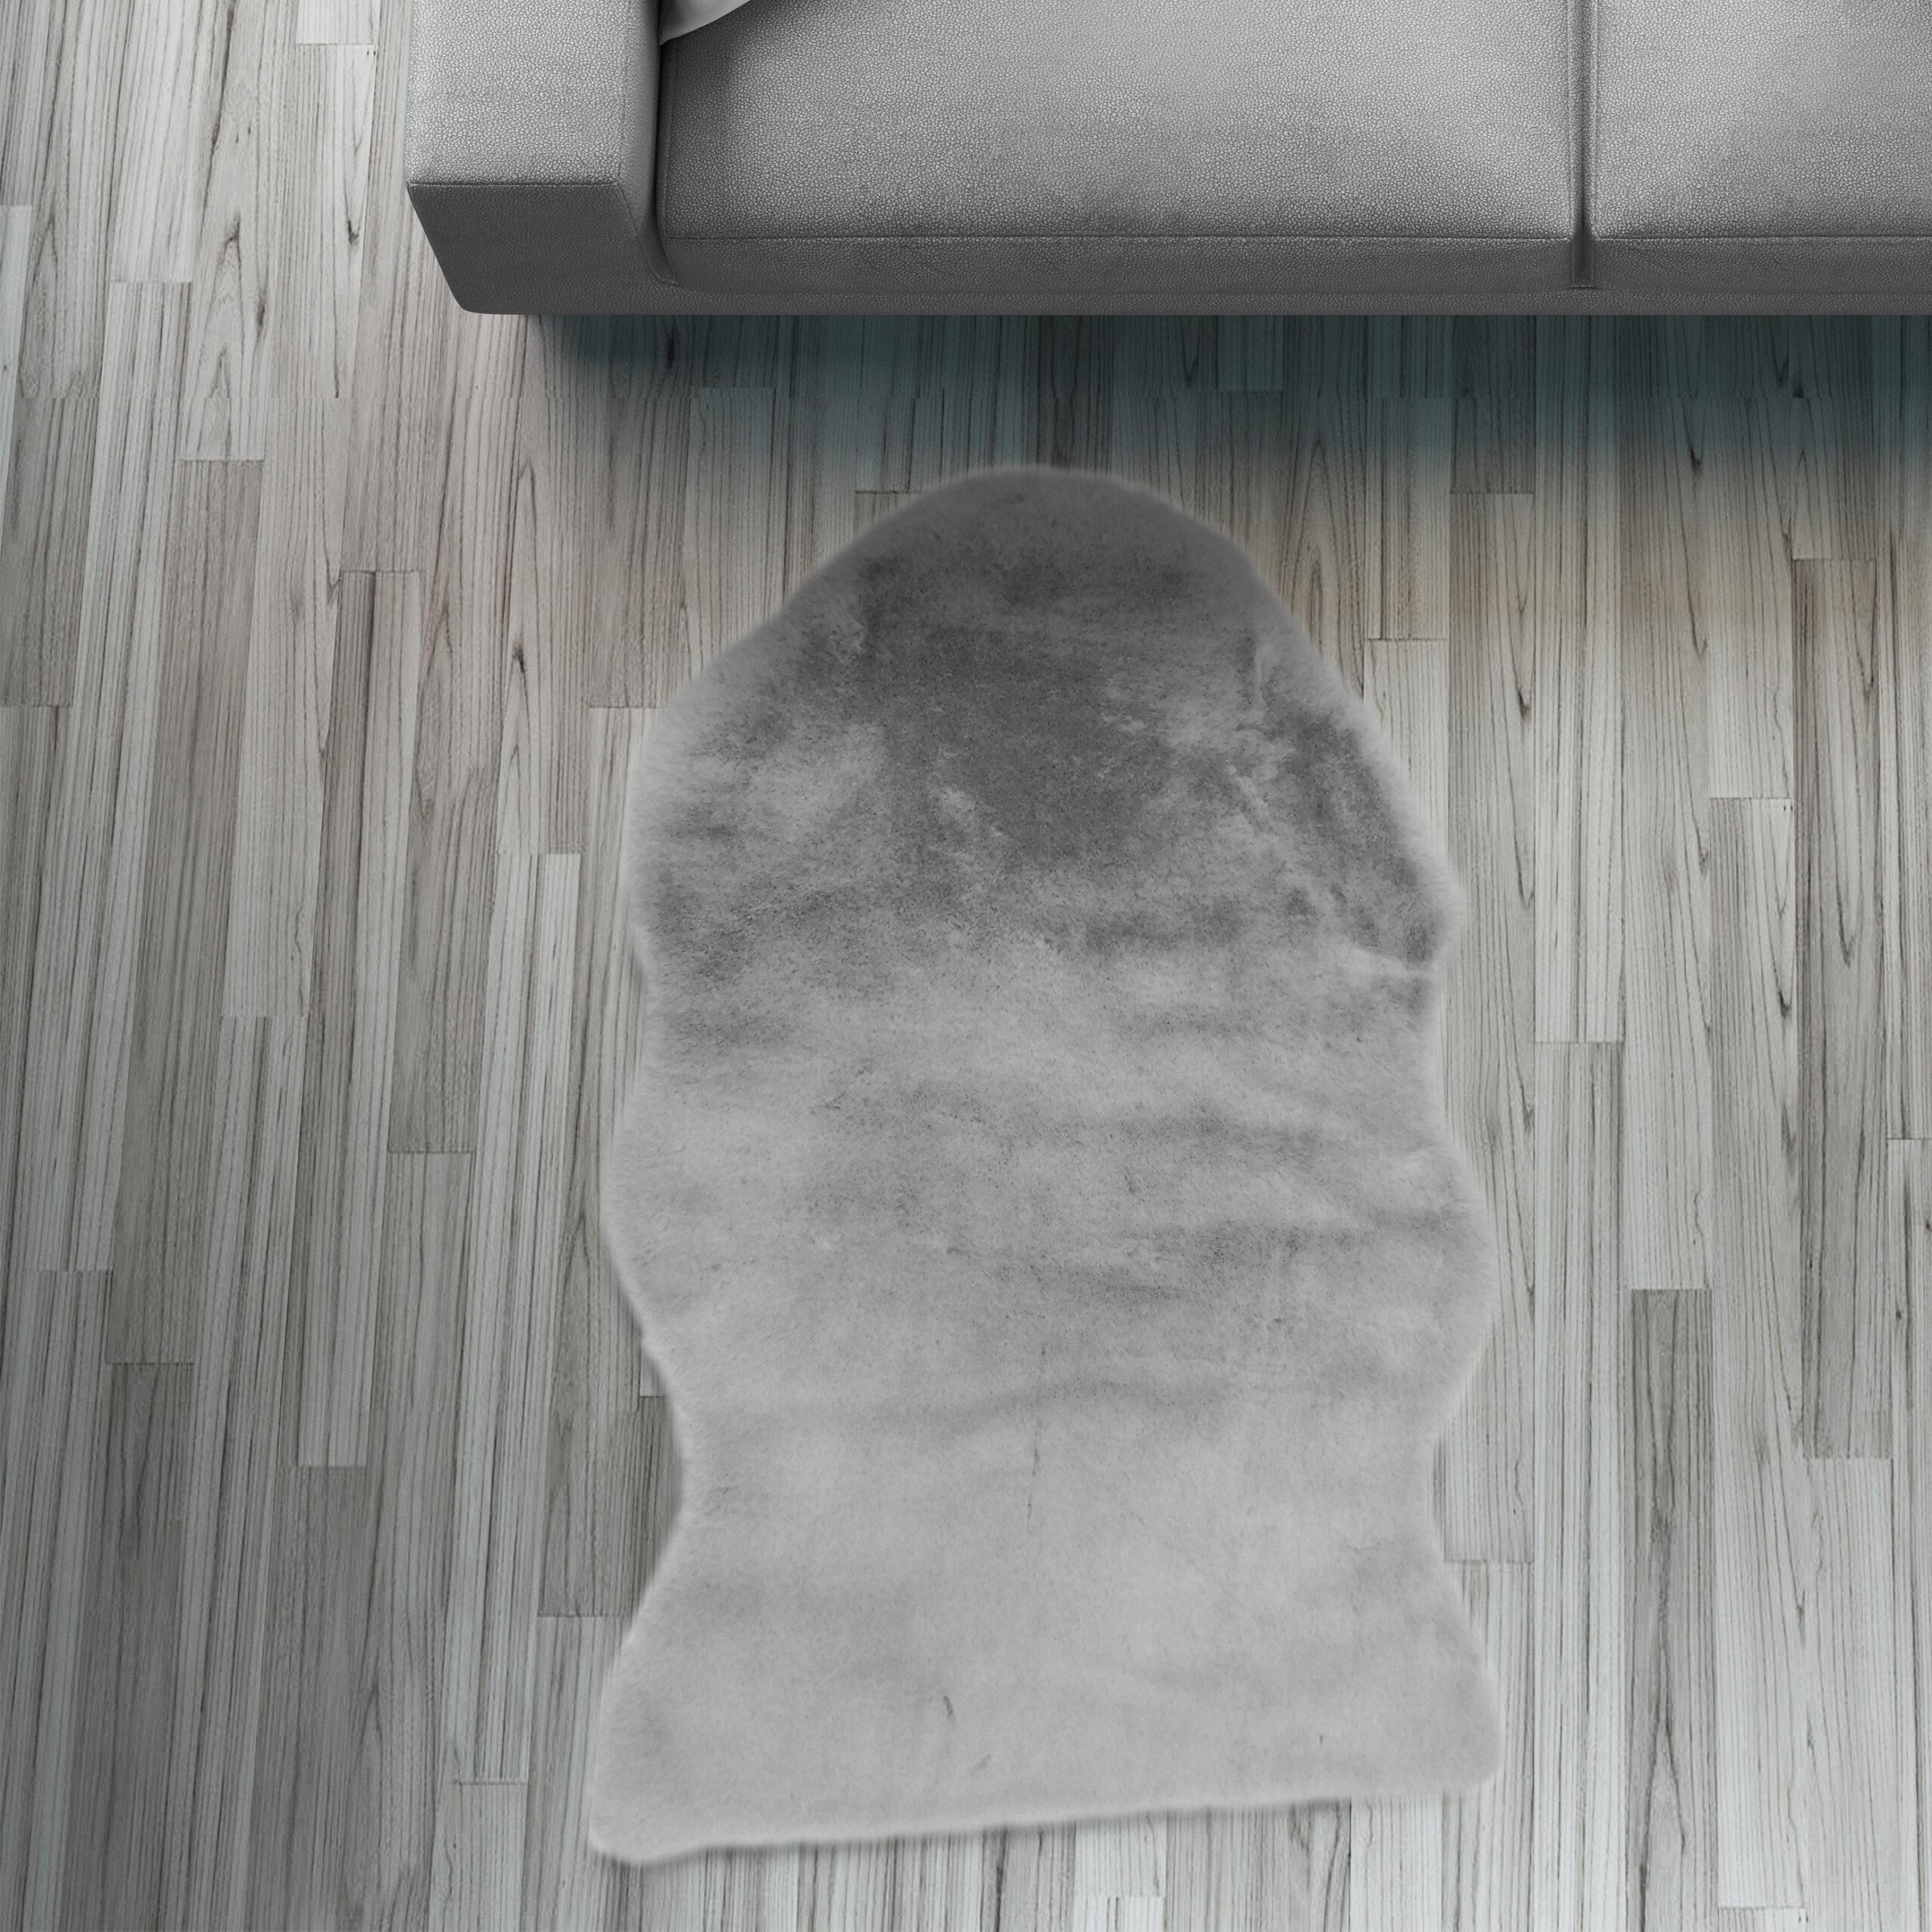 Full Size of Fell Lufer Teppich Grau 55x80 Cm Sofa Stuhl Matte Hasenfell Wohnzimmer Teppiche Home Affaire Bett Big Affair Wohnzimmer Home 24 Teppiche